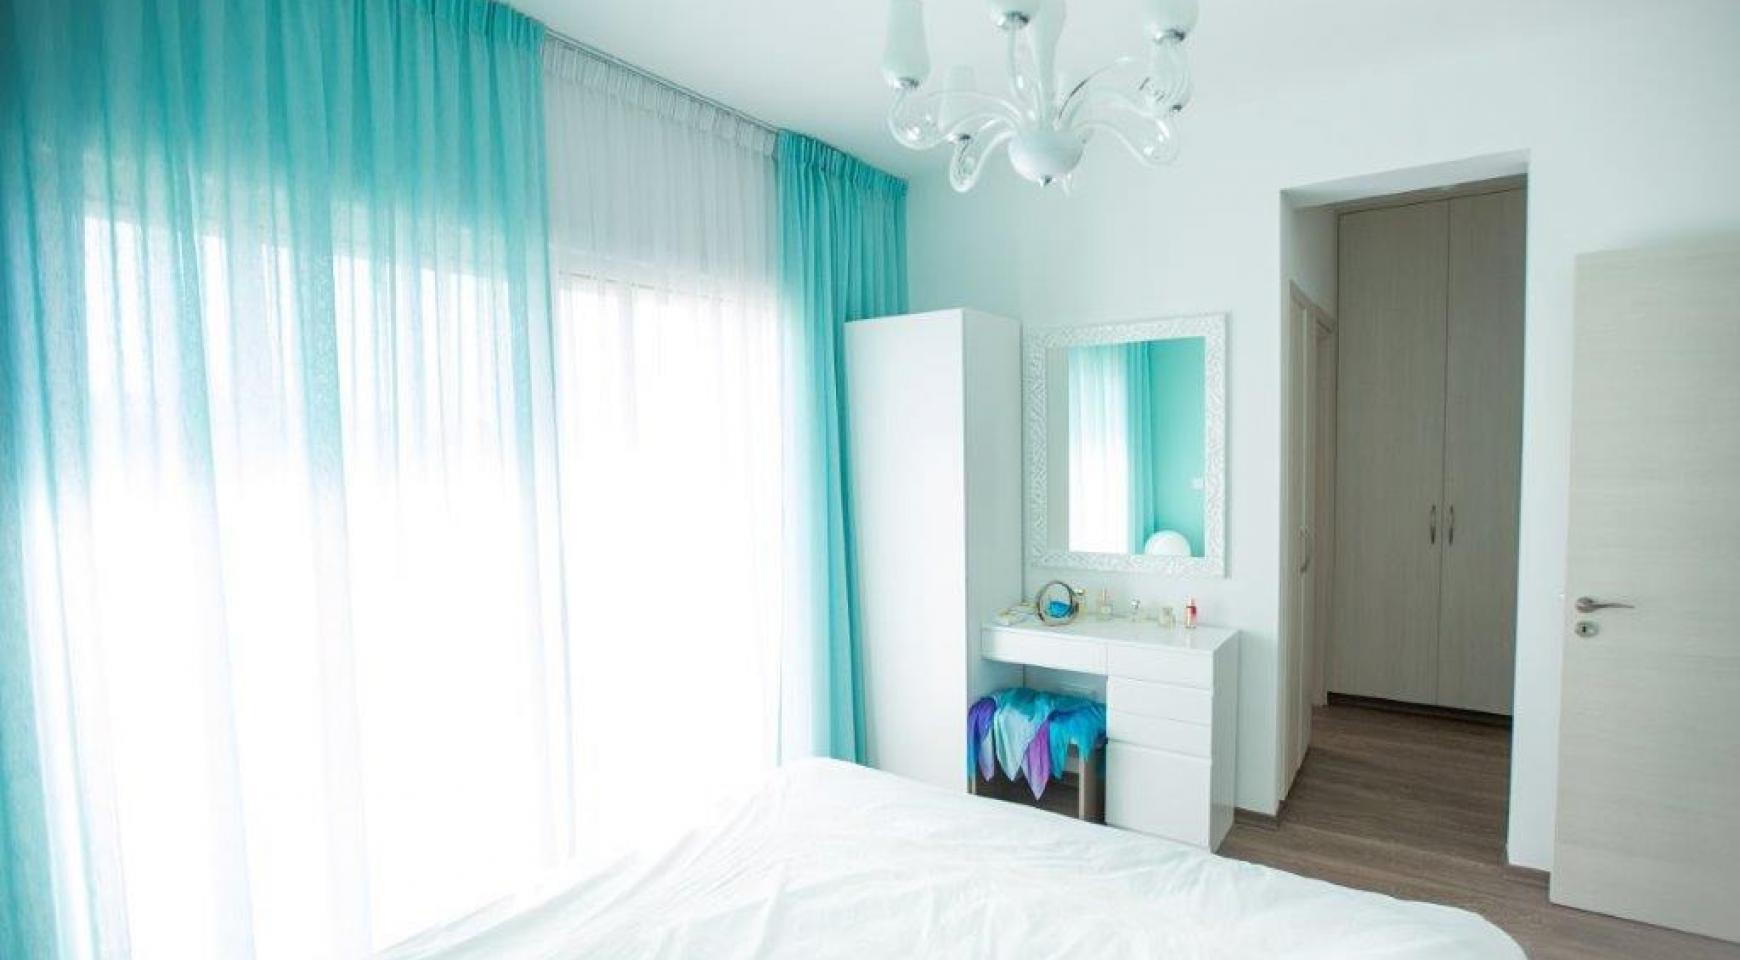 3 Bedroom Villa with Sea Views in Mouttagiaka - 9